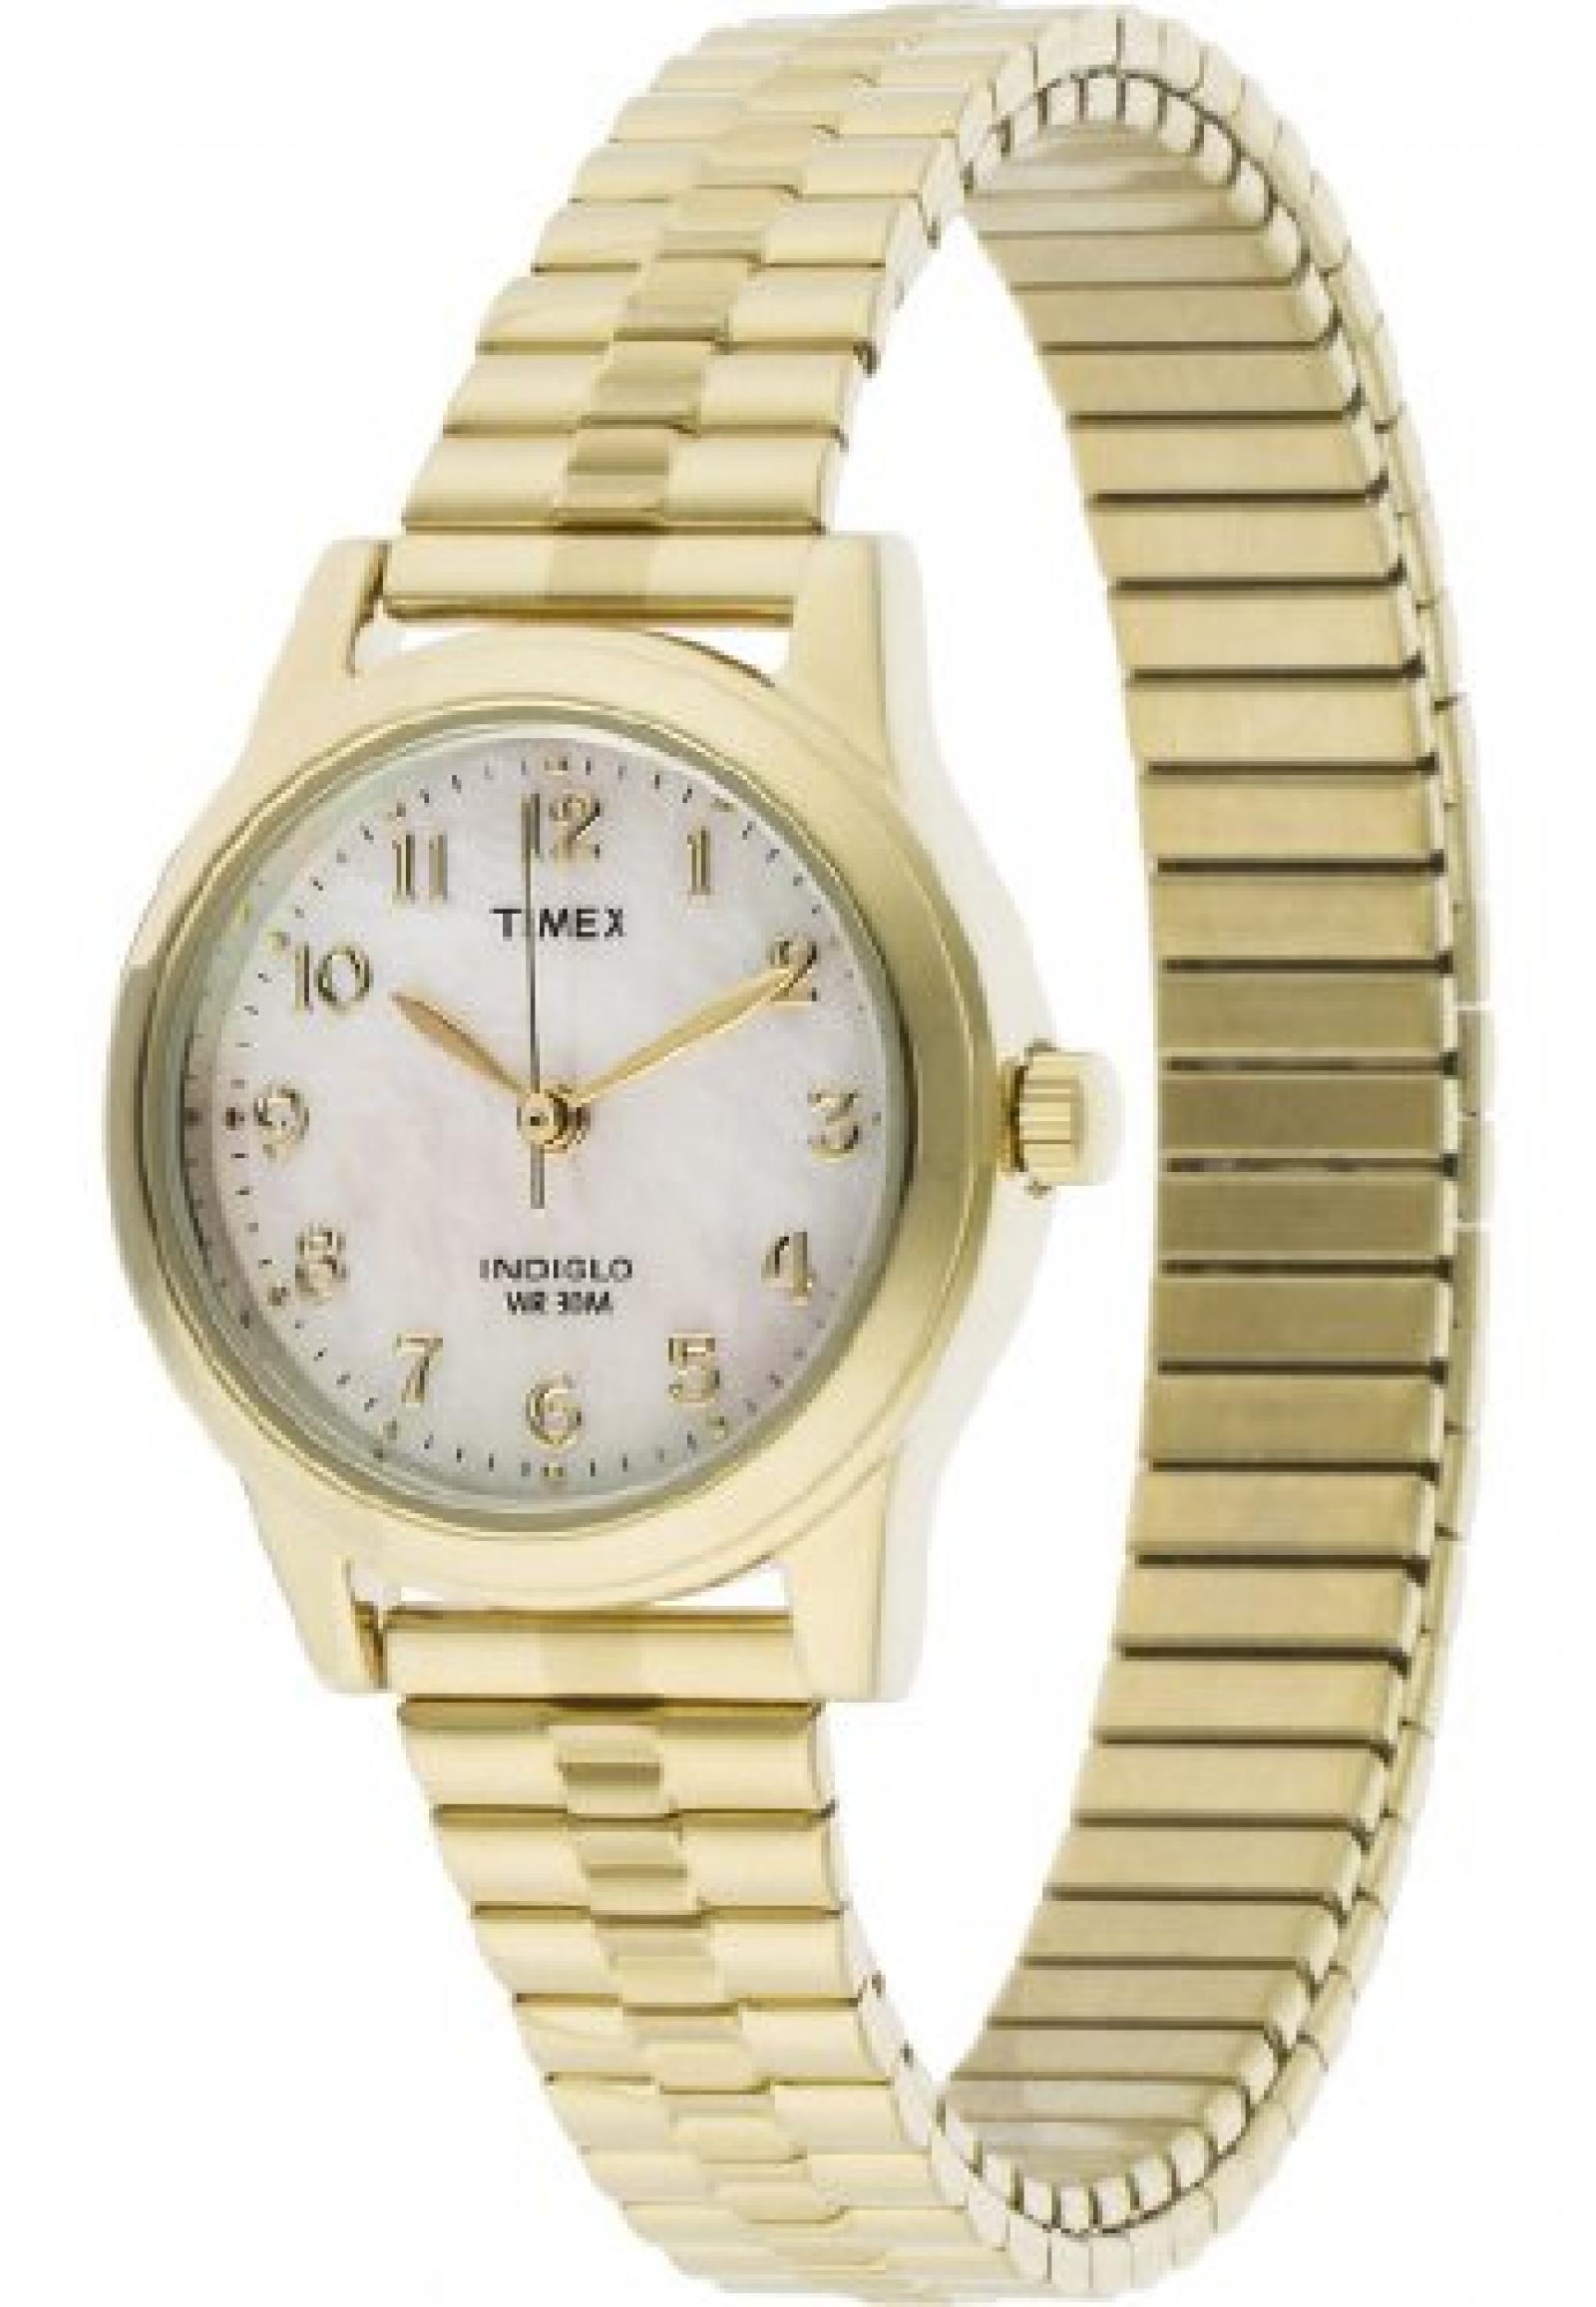 Timex Damen-Armbanduhr Core Expansion Analog Quarz (One Size, perlmutt)